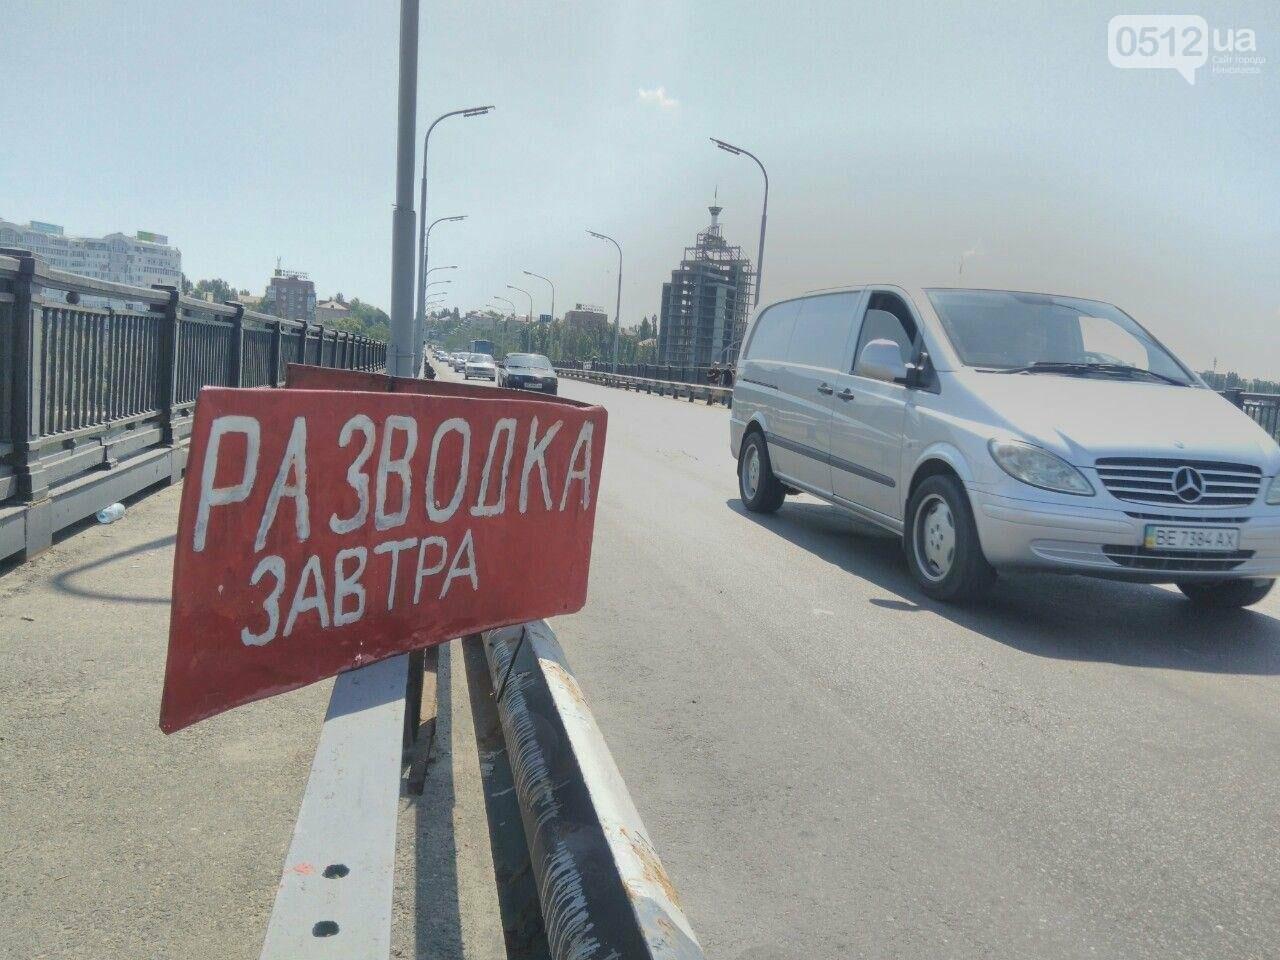 В Николаеве разводку мостов перенесли на завтра, - ФОТО, фото-4